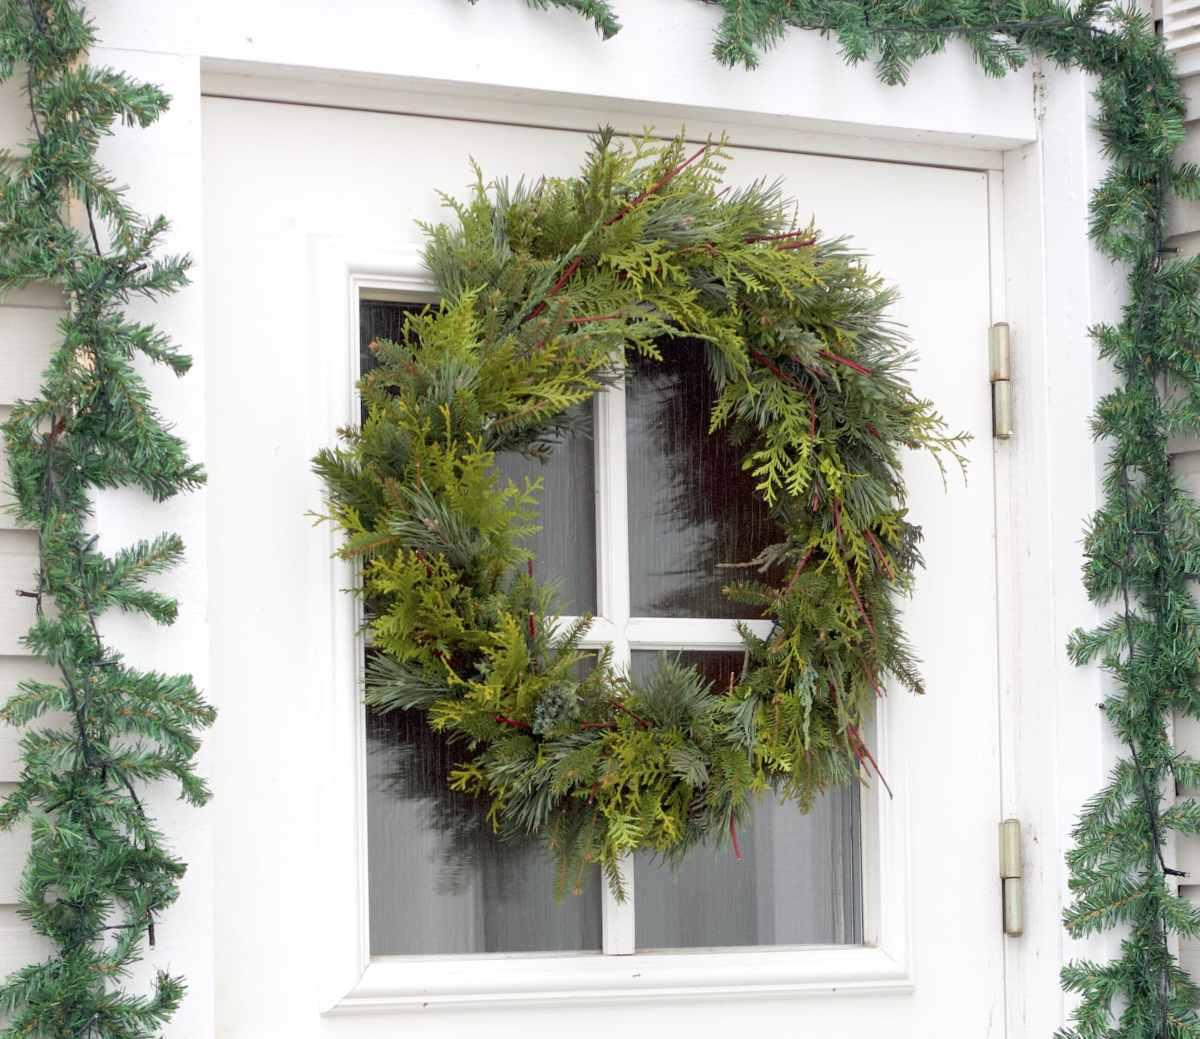 natalia lindberg trädgårdsdesign - juldekoration entré krans